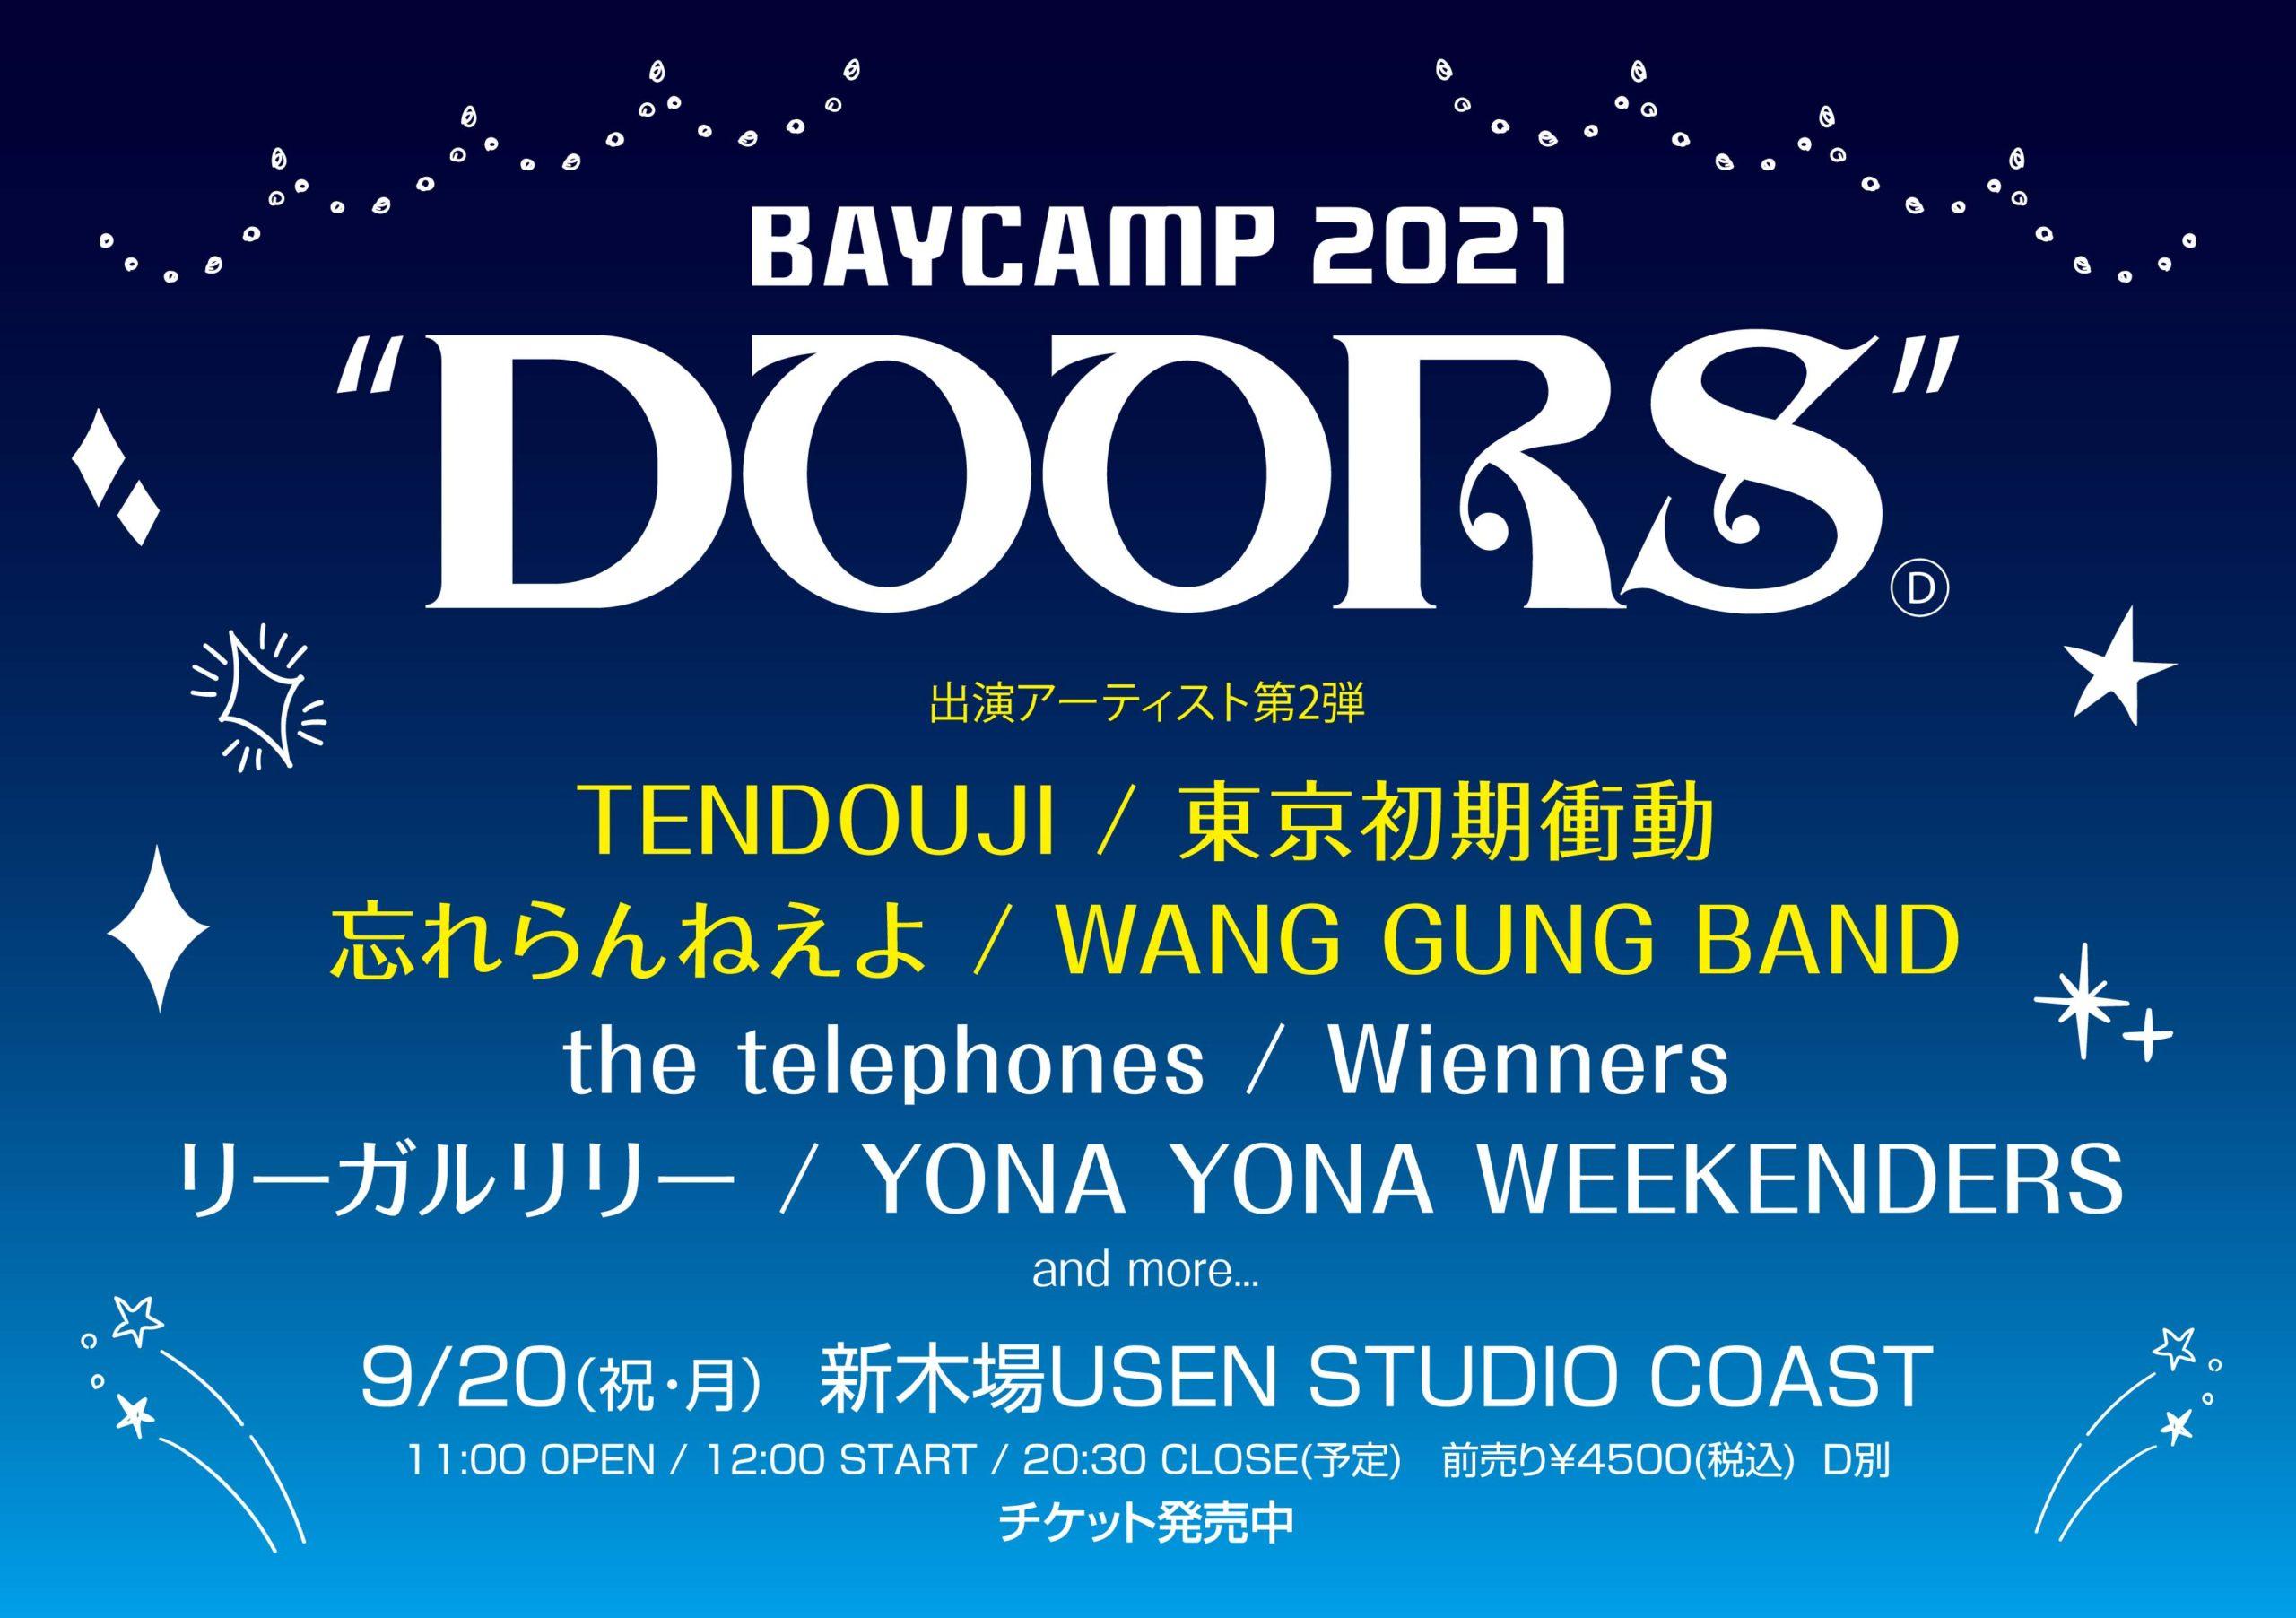 "BAYCAMP 2021 ""DOORS"" 第2弾出演アーティスト解禁"